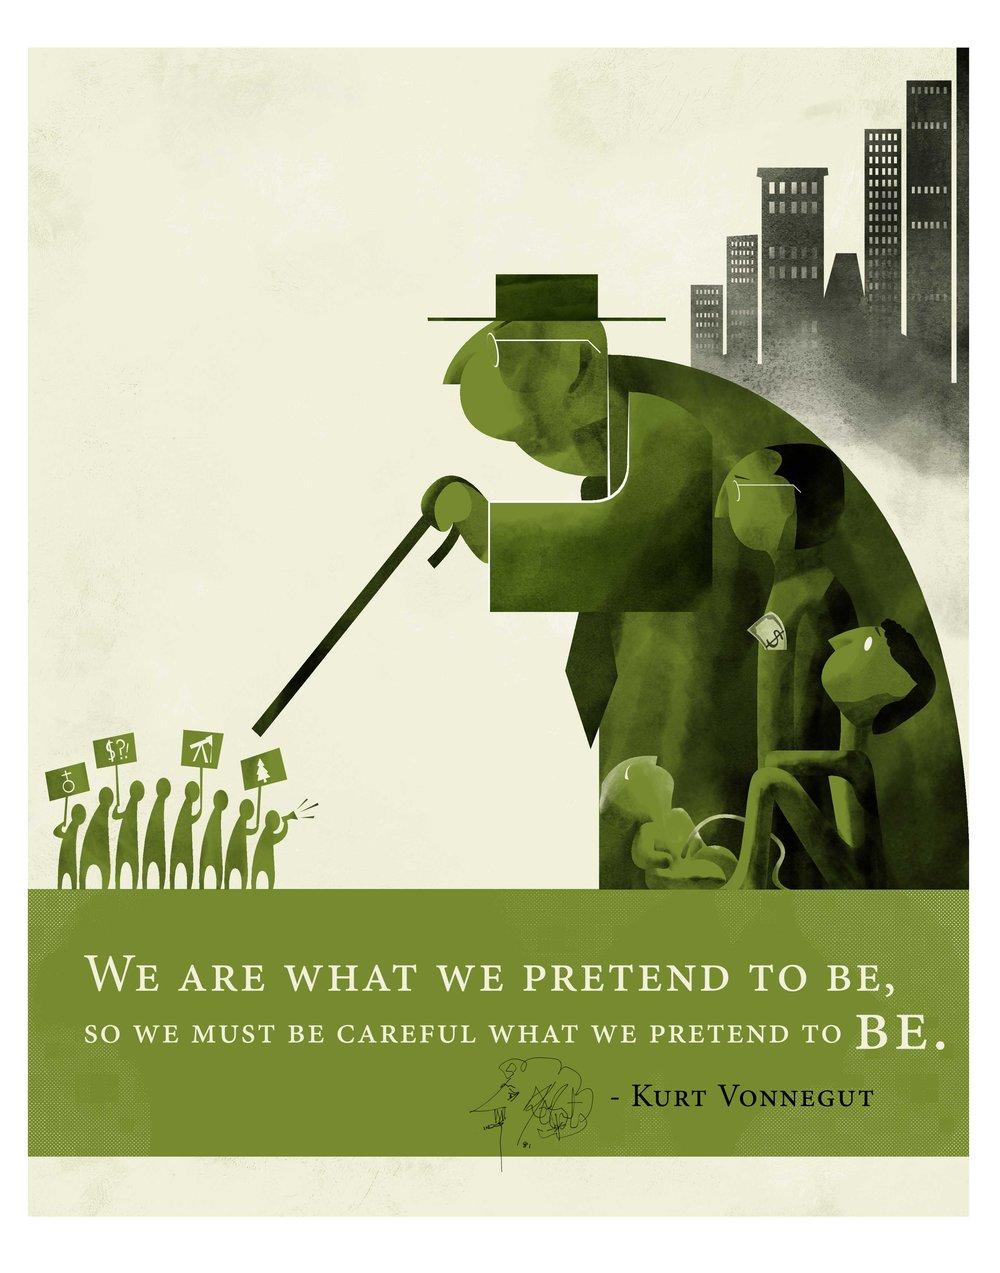 Quote Illustration - Kurt Vonnegut